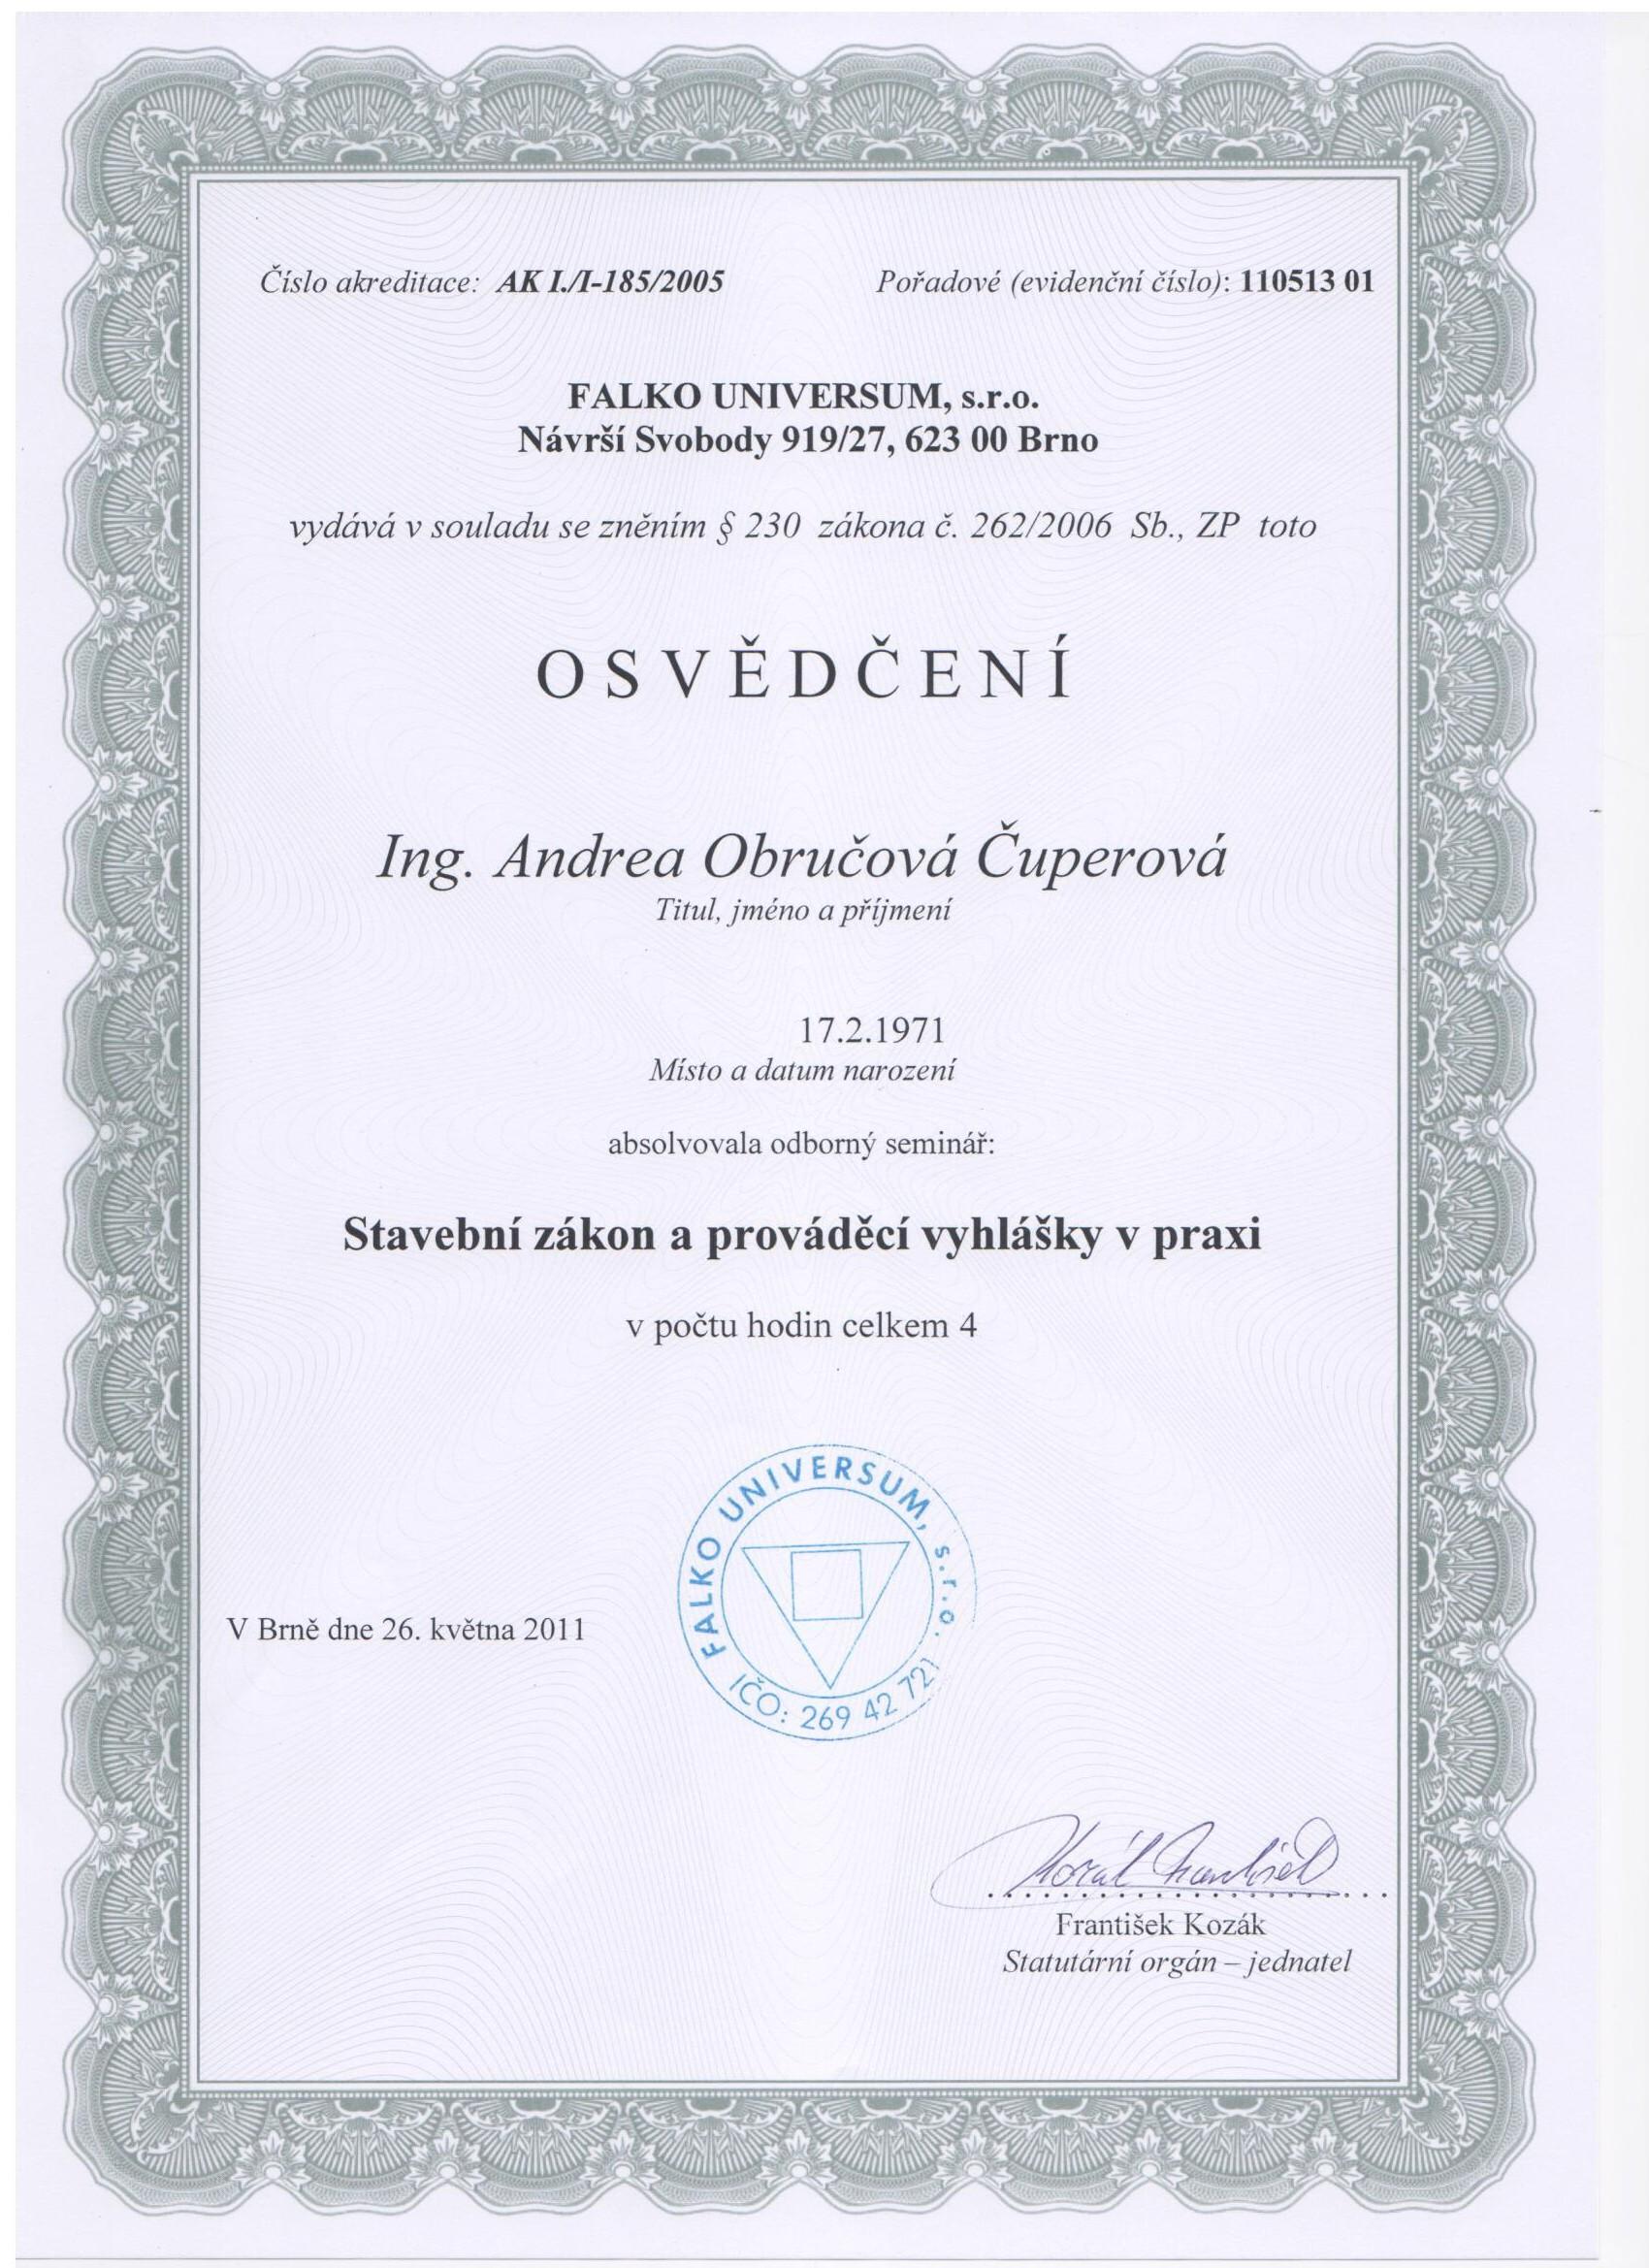 Osvedceni stavebni zakon 2011